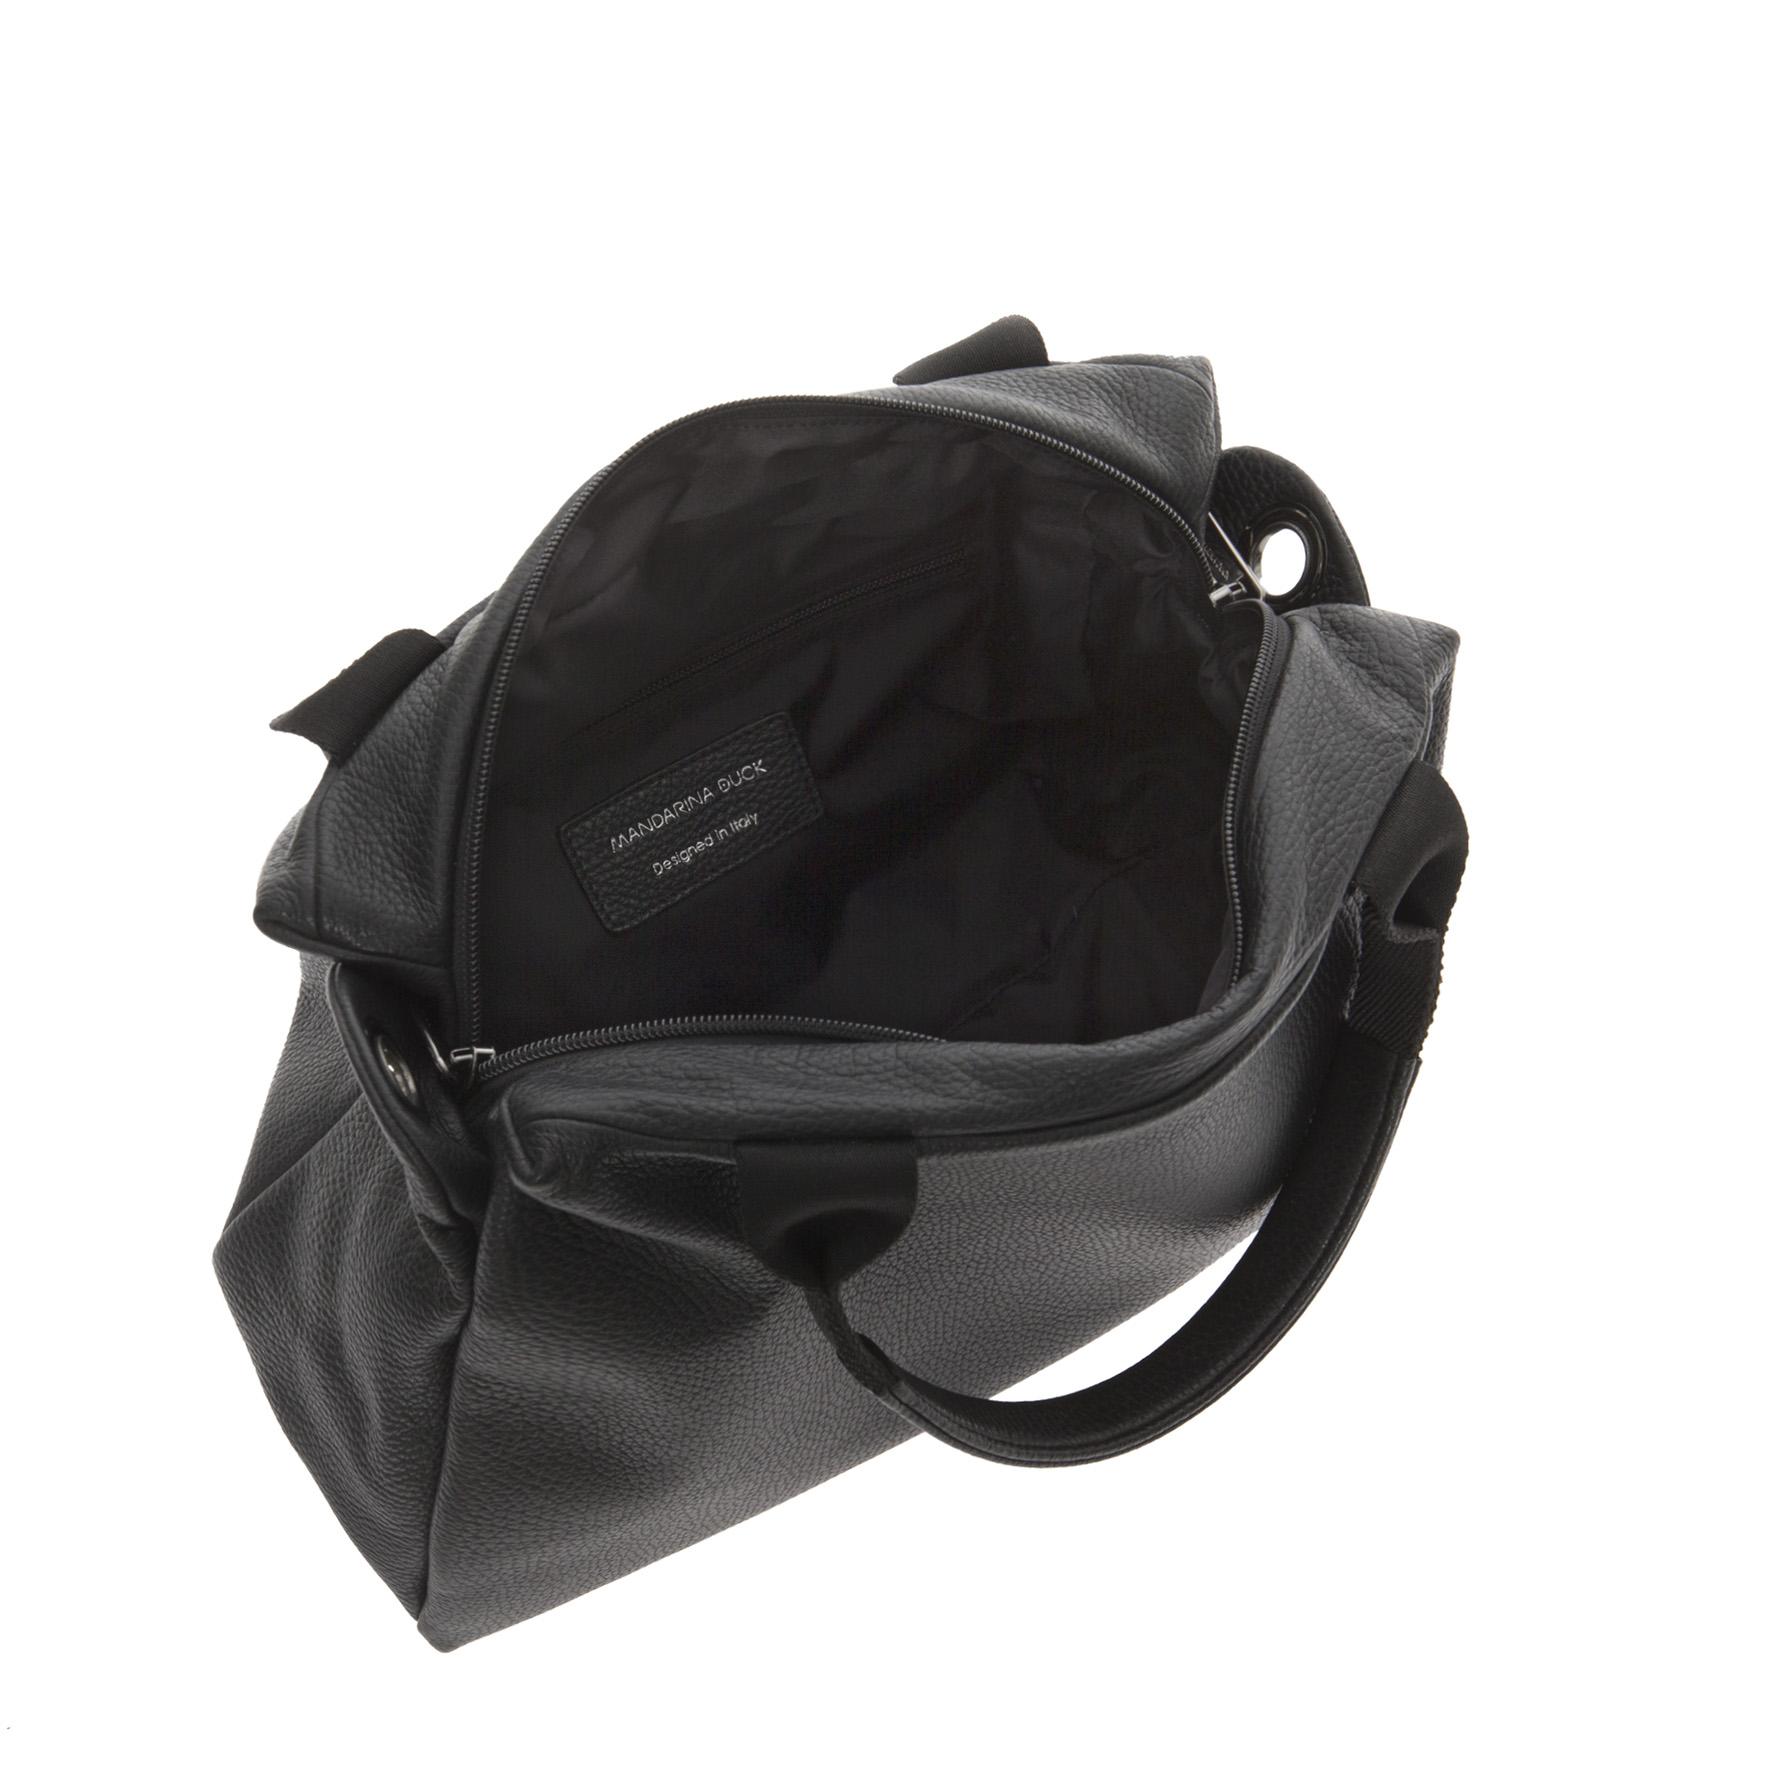 4a61812199 Mellow Leather Shoulder Bag Mandarina Duck | The Art of Mike Mignola